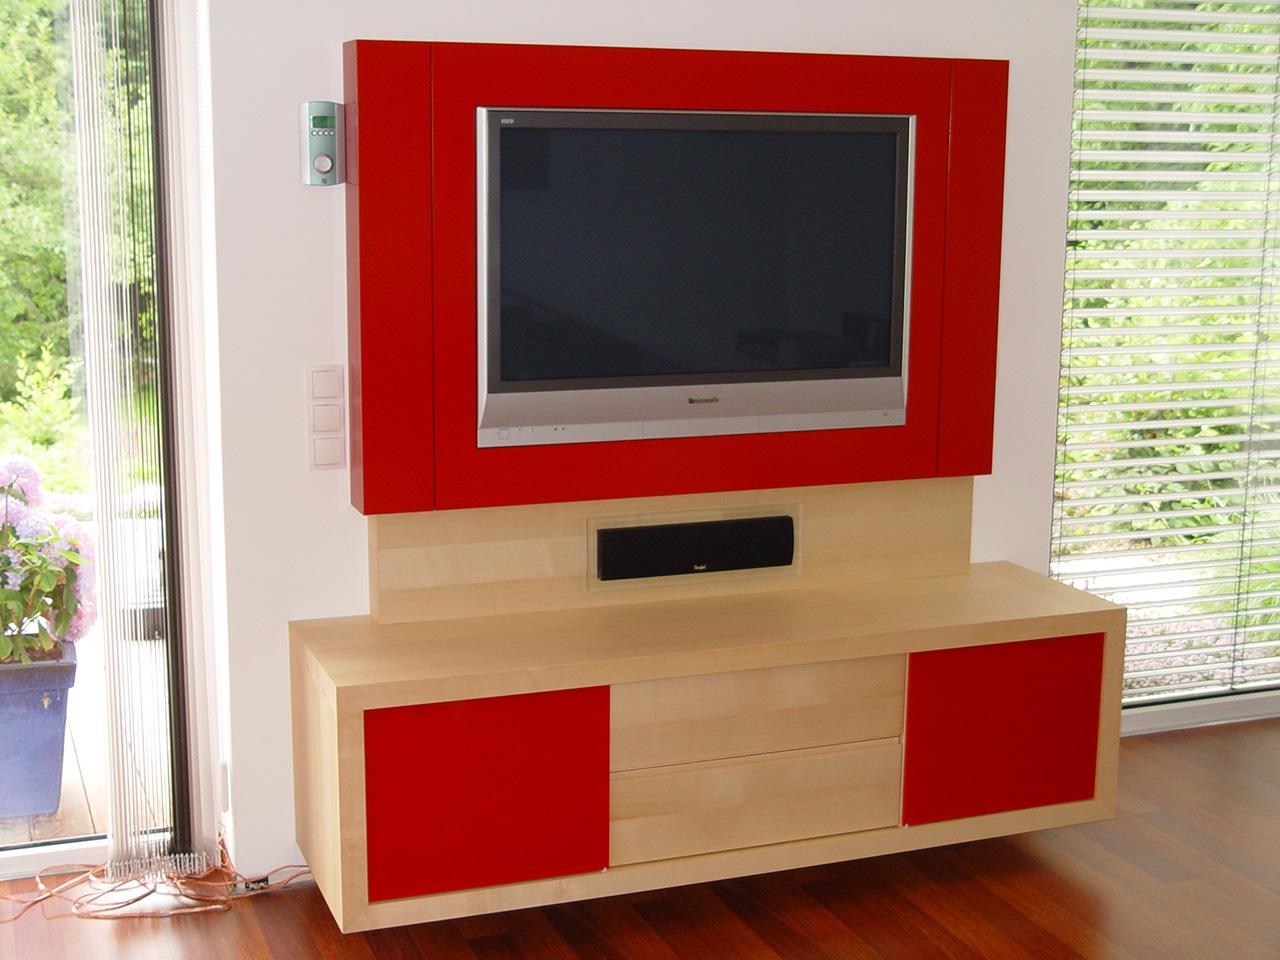 A10-TV--Wand-in-Ahorn-Furnier--lackiertem-Holz-und-Glas